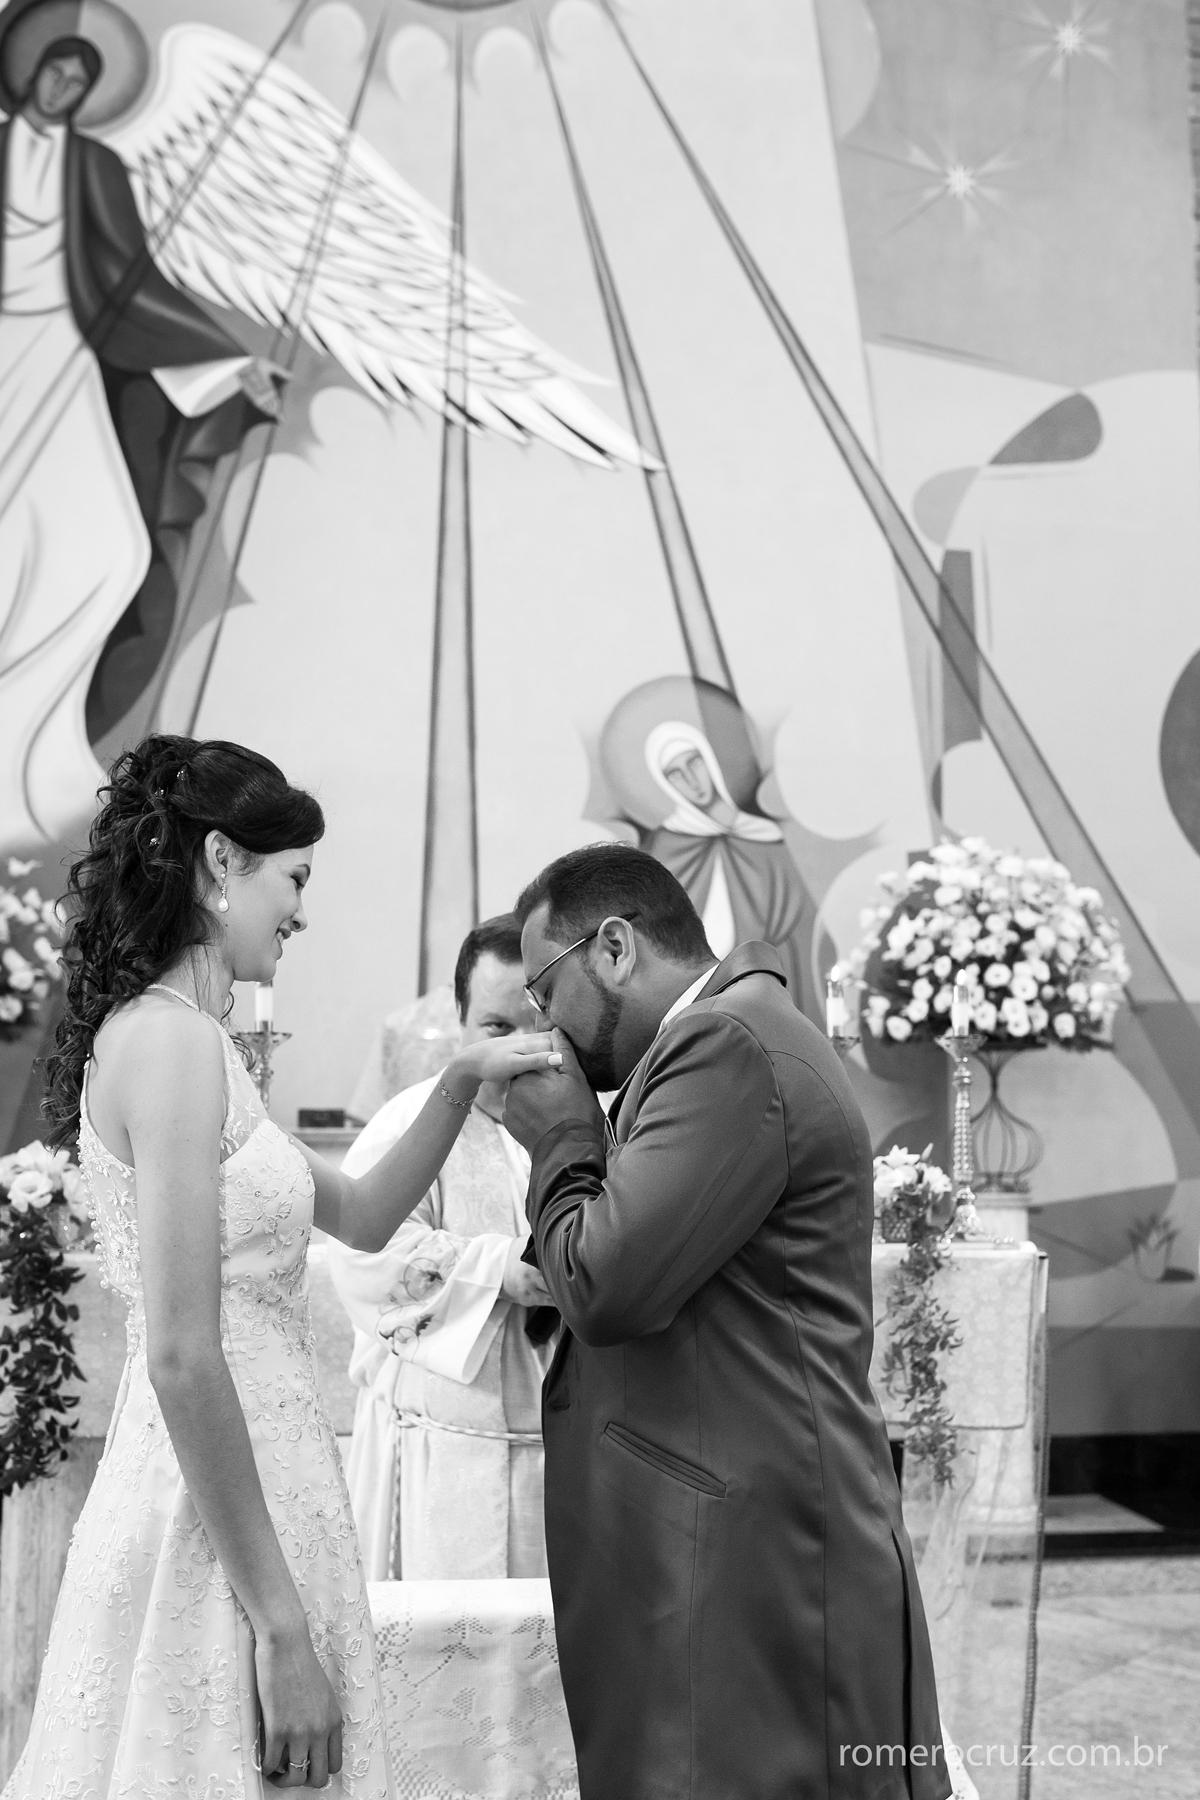 Romero Cruz fotógrafo profissional de casamento fotografa beijo emocionante do noivo